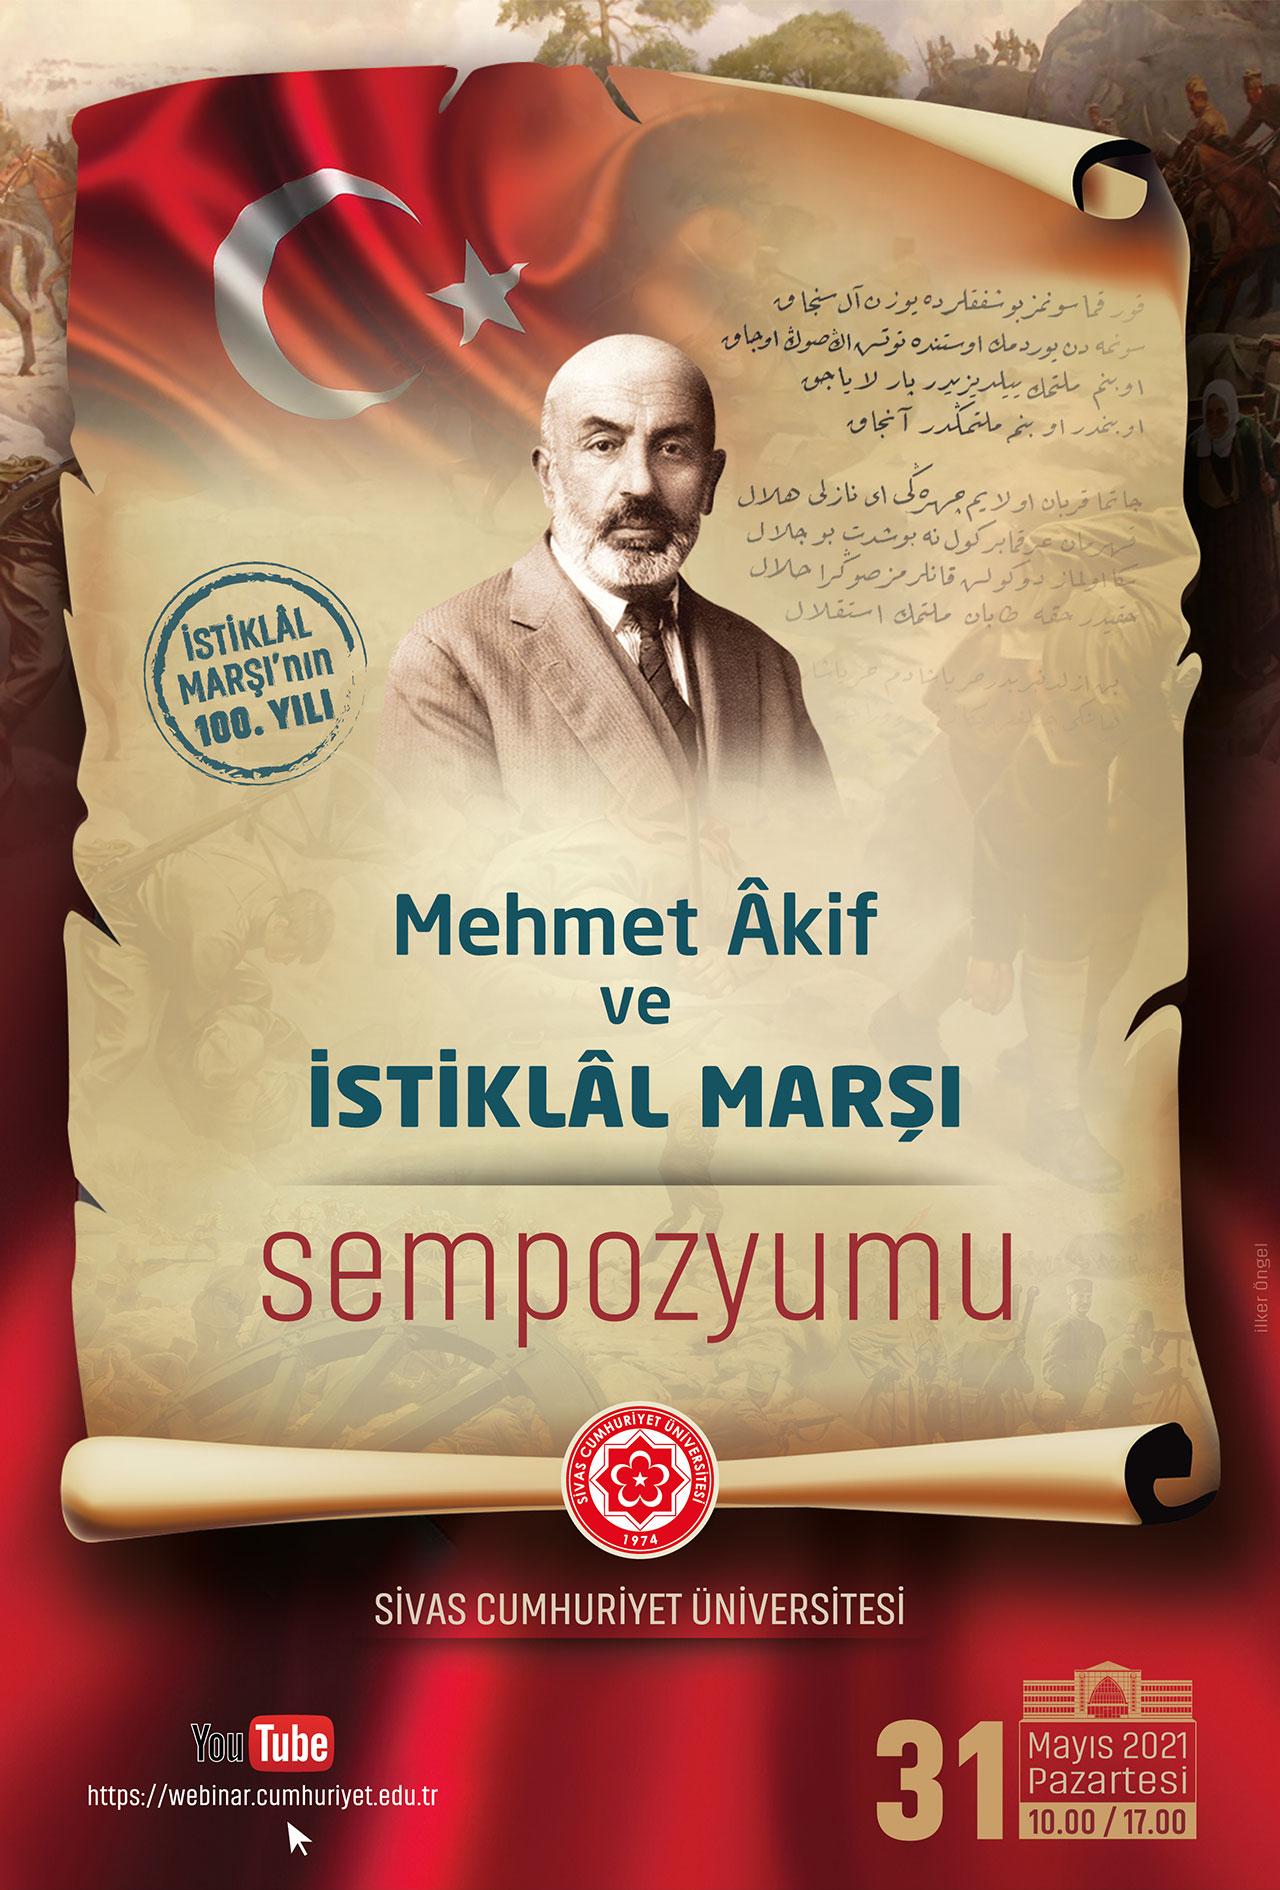 0147-sempozyum-mehmet-akif-ve-istiklal-marsi-ana-poster.jpg